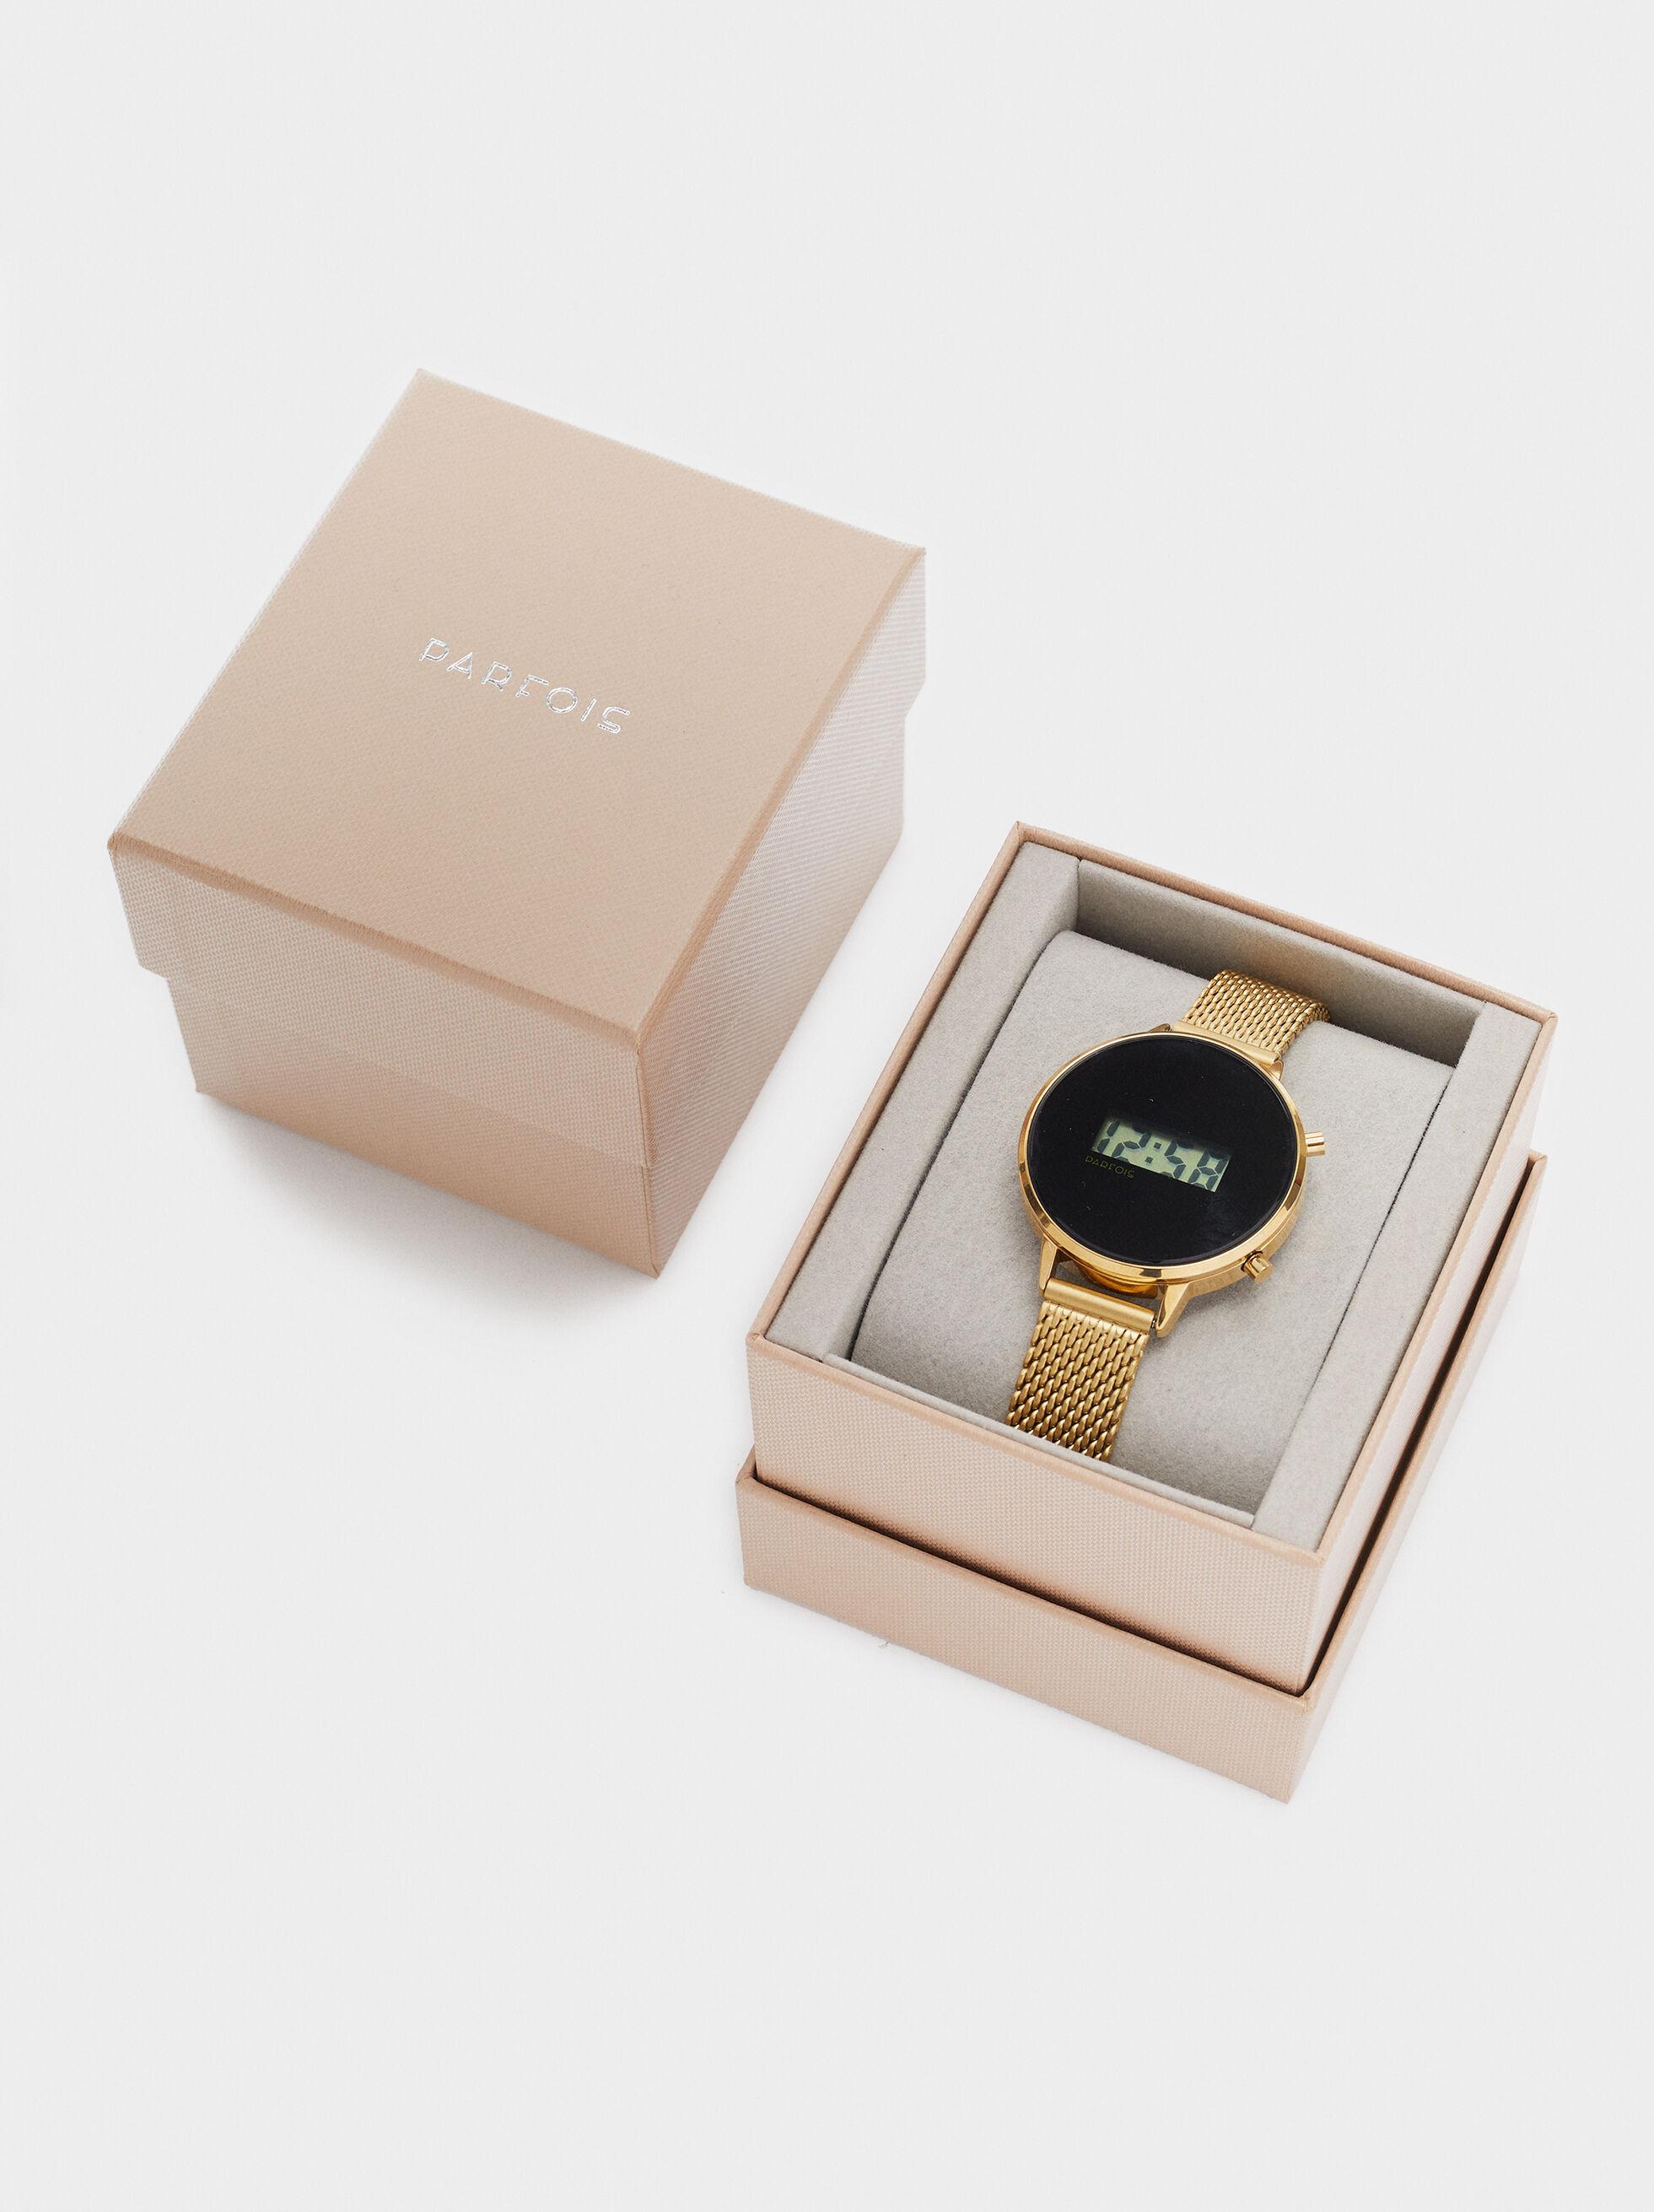 Digital Watch With Metallic Mesh Wristband, Golden, hi-res